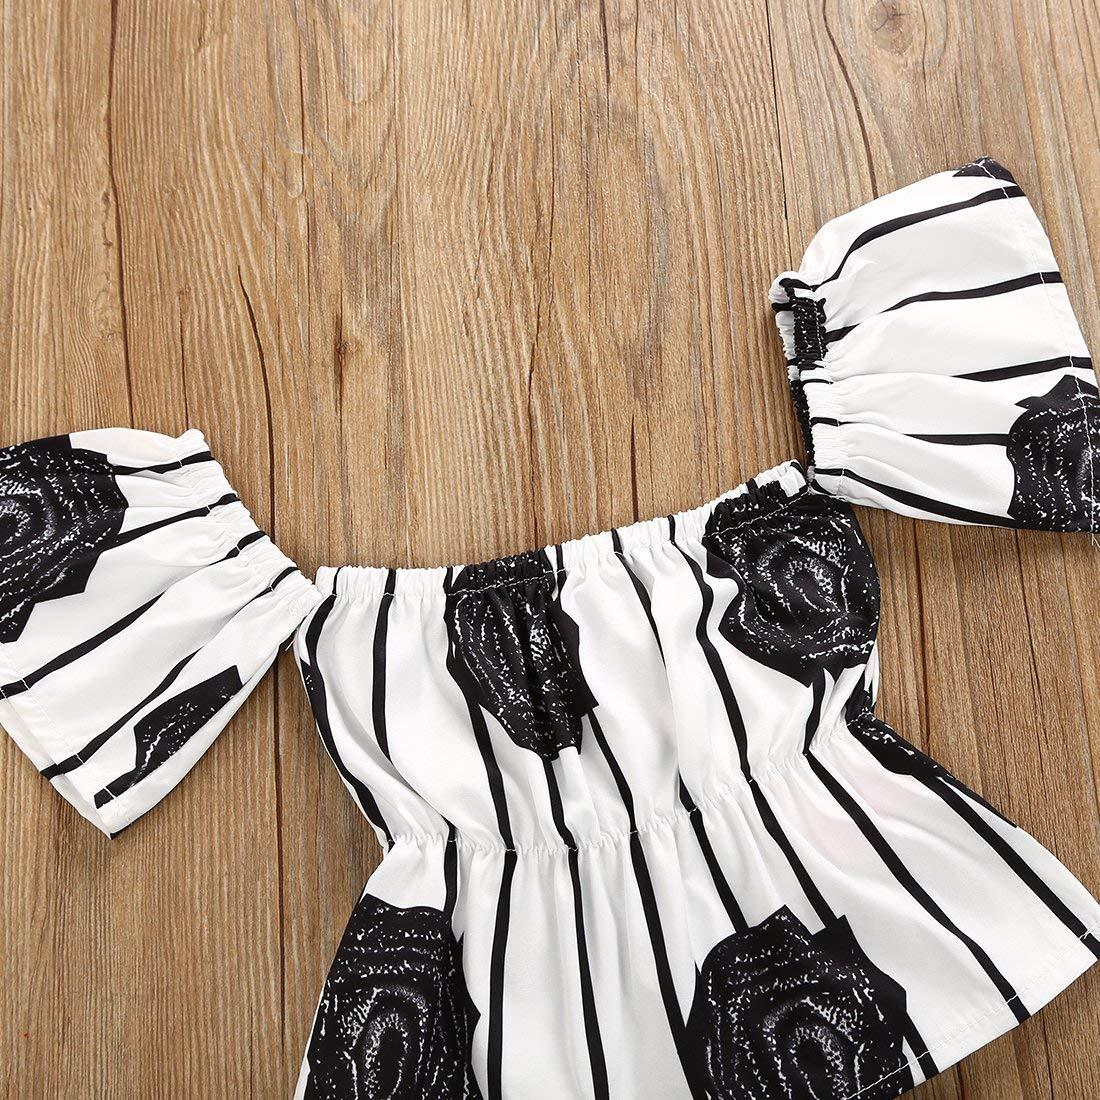 Baby Girls Outfits Halter T-Shirt Top Short Pants Sets Floral Fruit Flamingo Print Ruffle Sleeveless Wide Leg Strap Halter